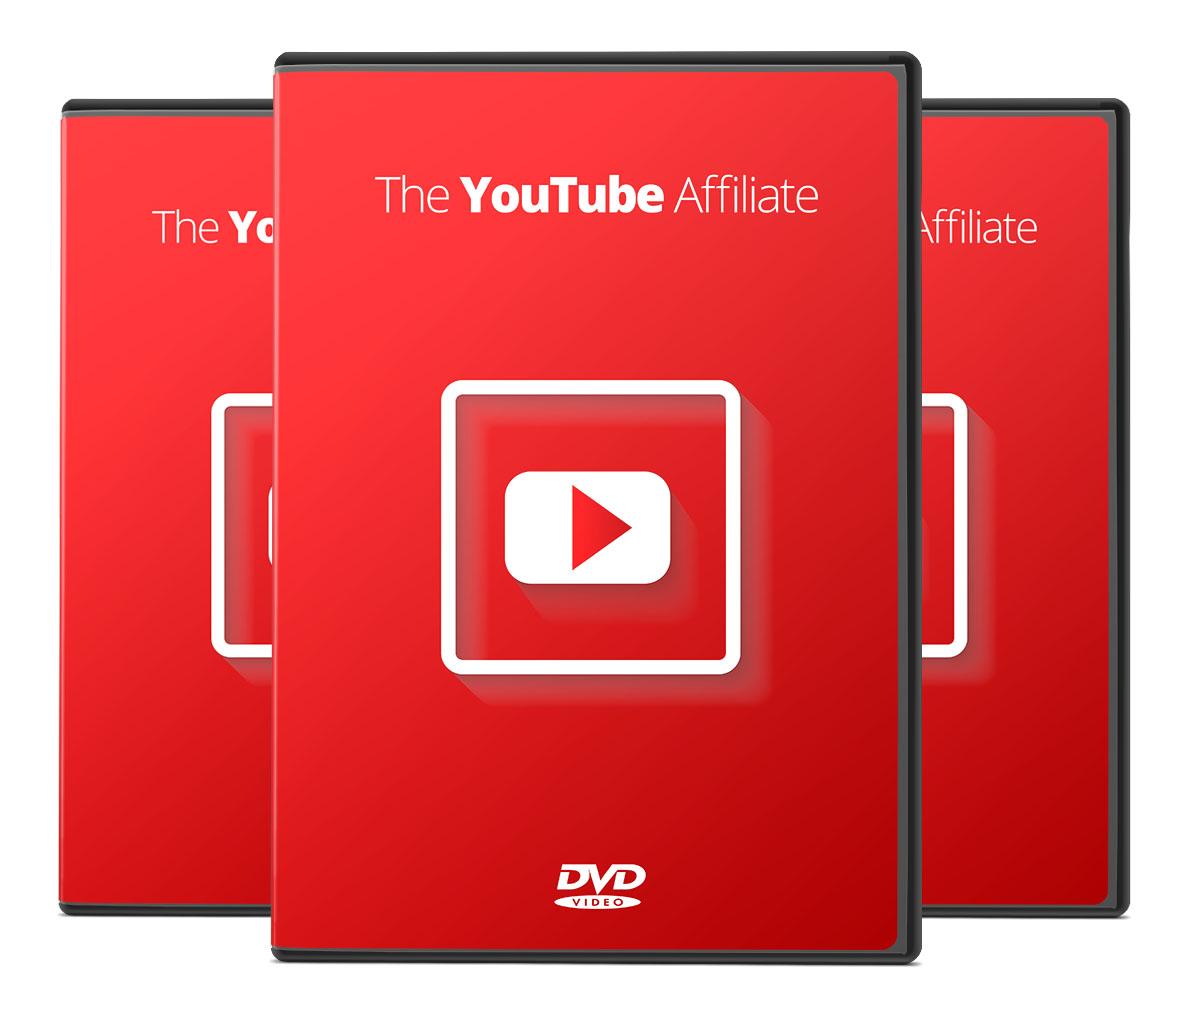 The YouTube Affiliate The YouTube Affiliate